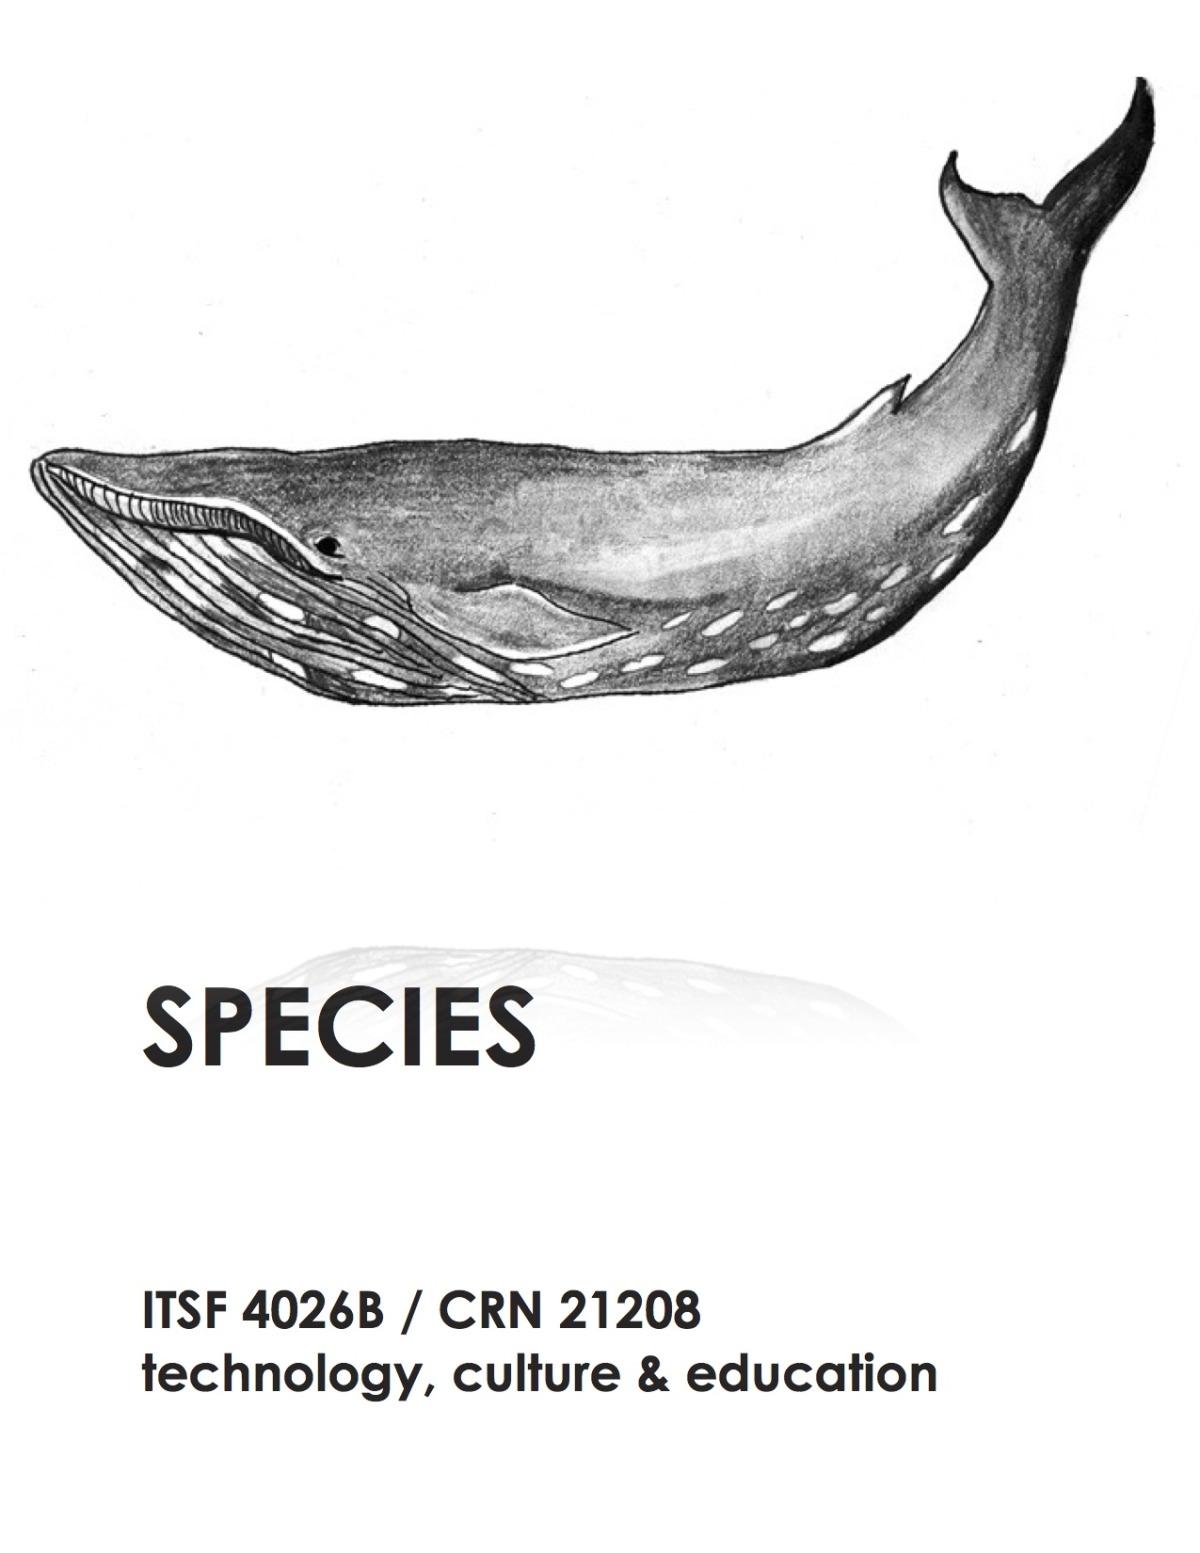 itsf 4026b flyers - species.jpg